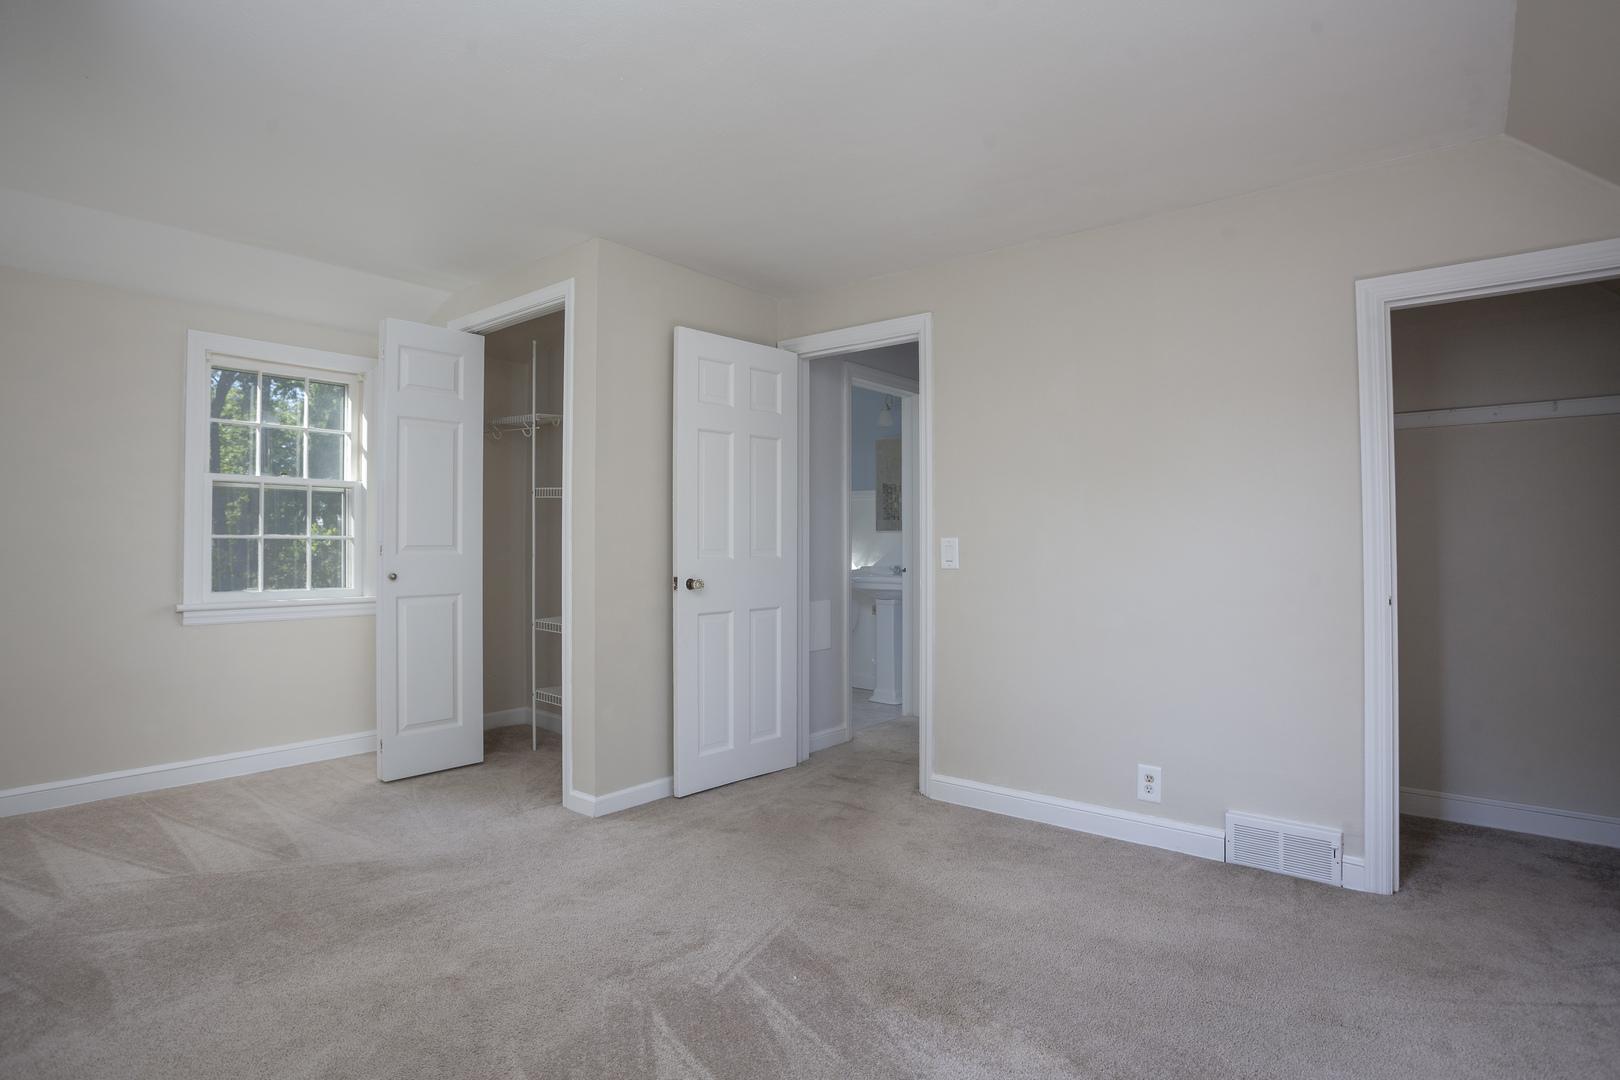 loves park senior singles 3 bedrooms / 2 bathrooms $79300 / month 3 bedroom single family home for rent in loves park for $79300.